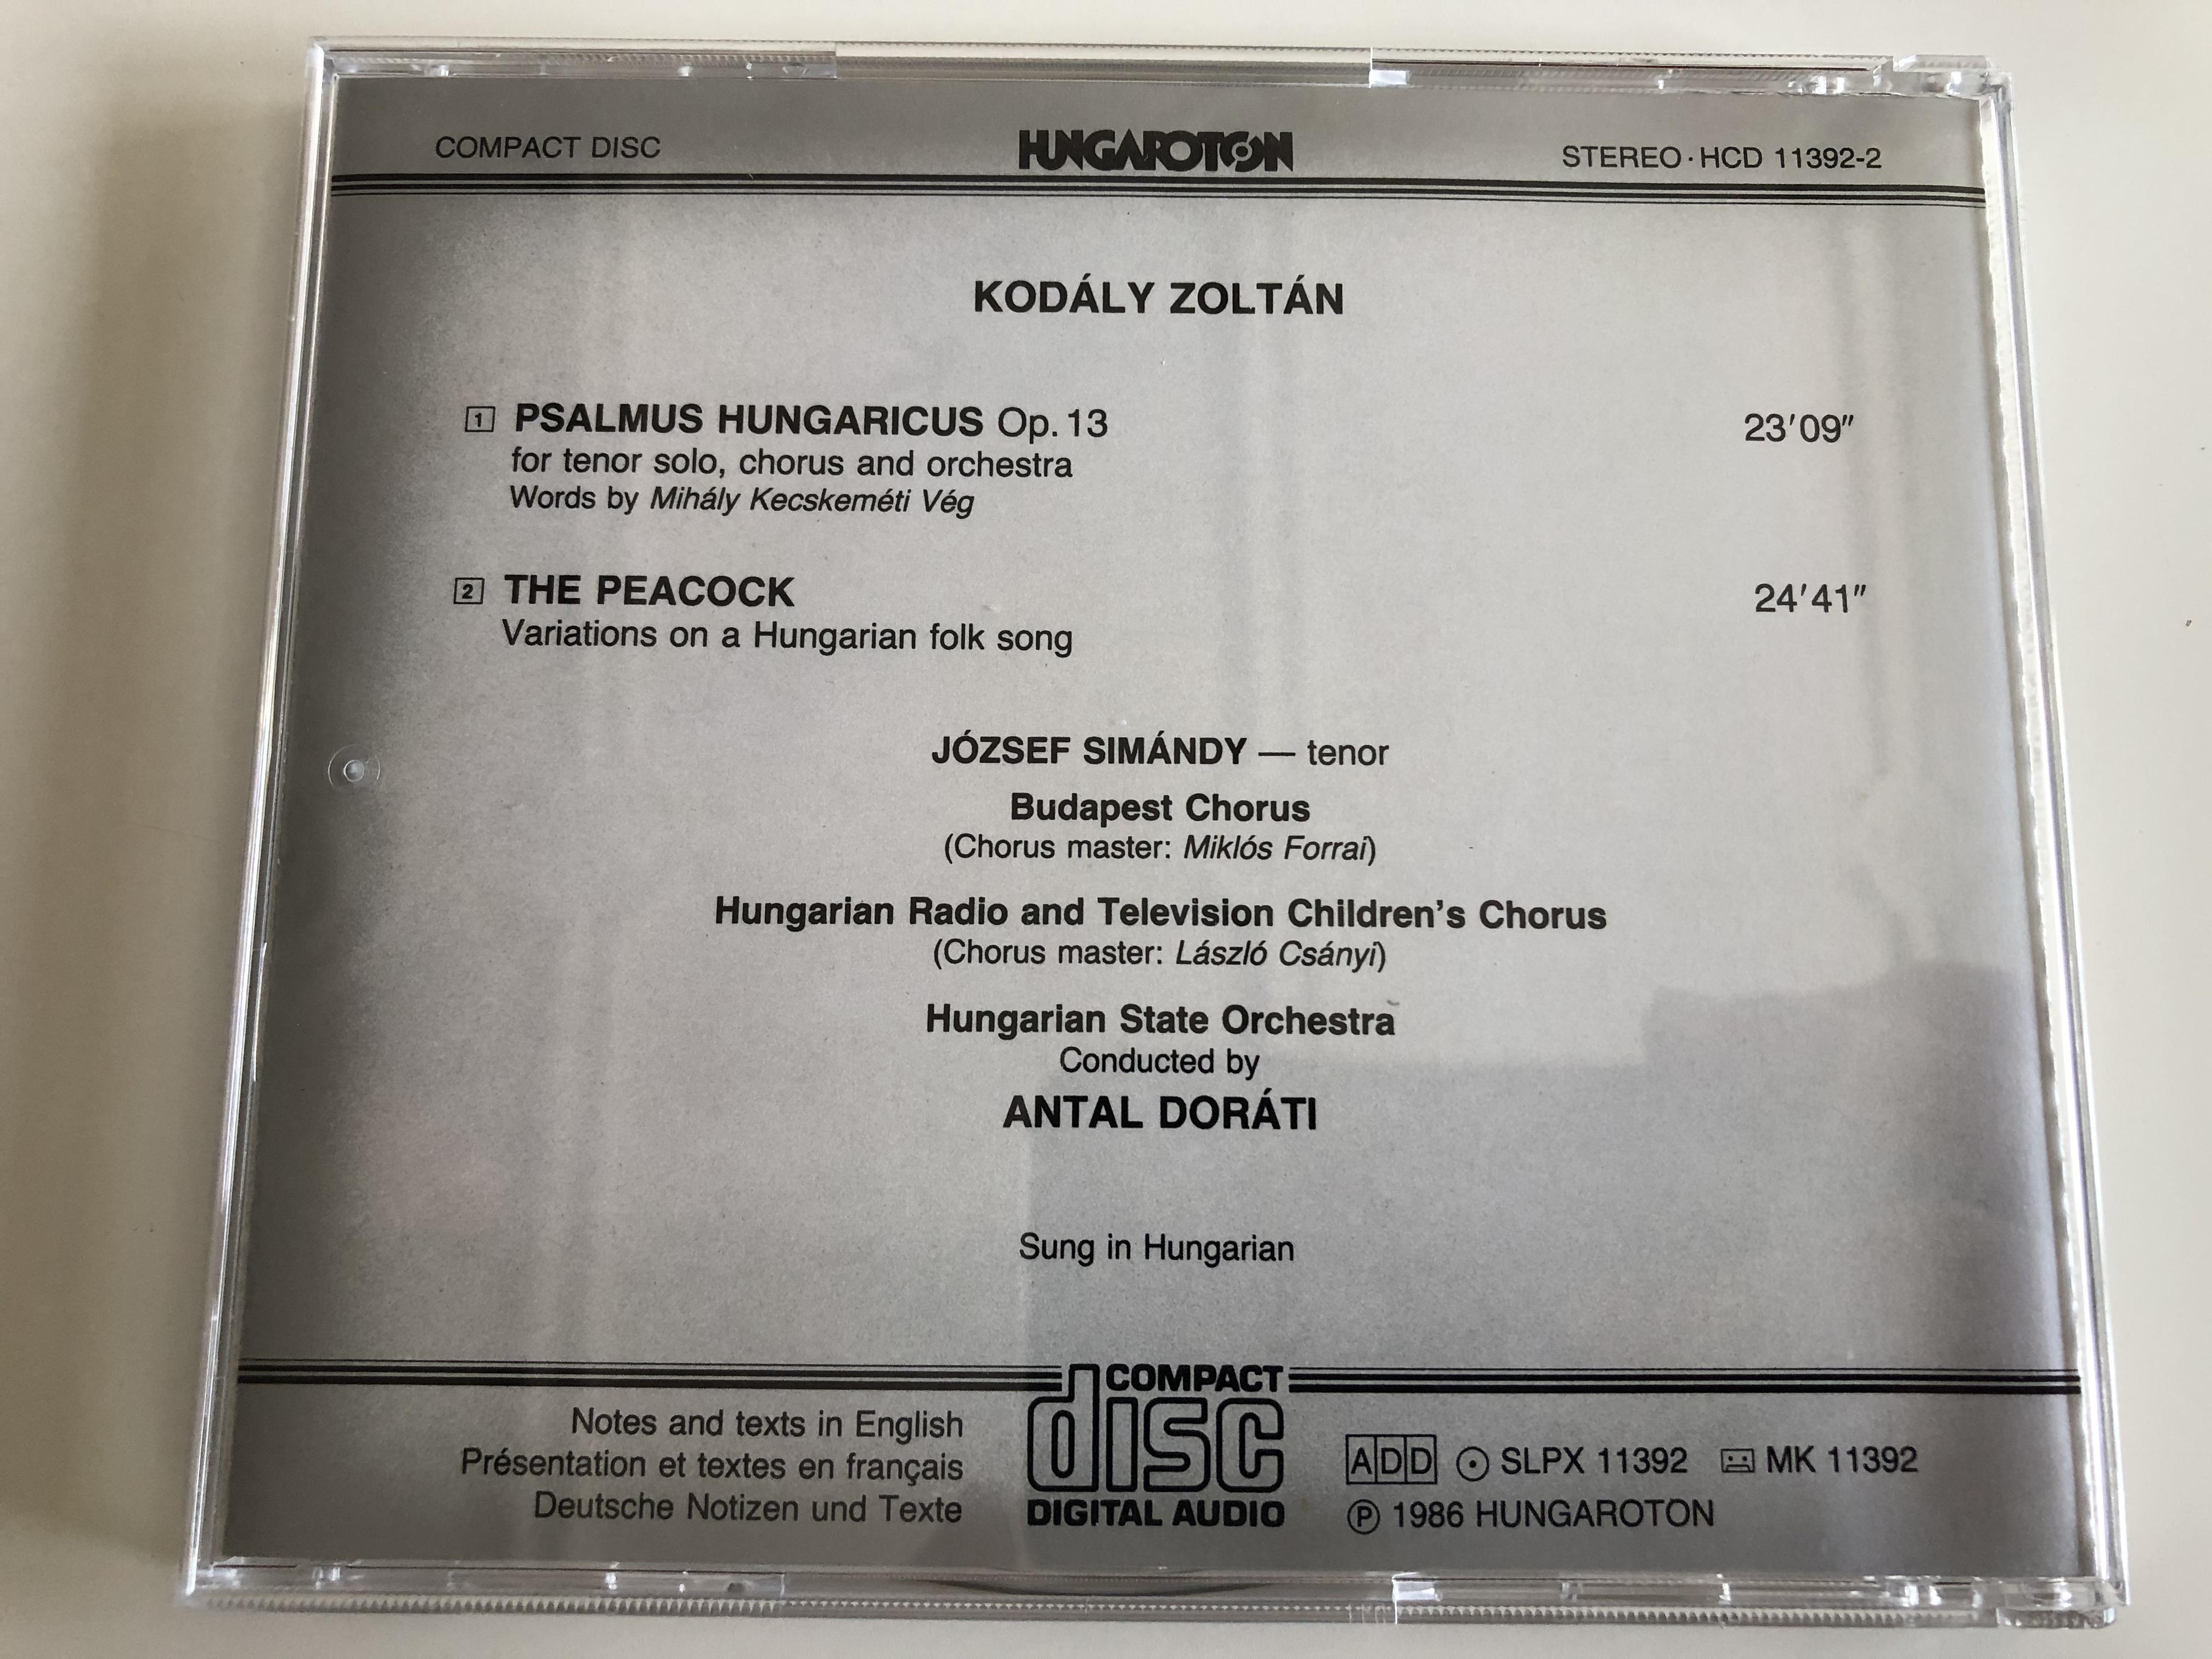 kod-ly-psalmus-hungaricus-peacock-variations-j-zsef-sim-ndy-budapest-chorus-hungarian-state-orchestra-antal-dorati-hungaroton-audio-cd-1986-stereo-hcd-11392-2-8-.jpg